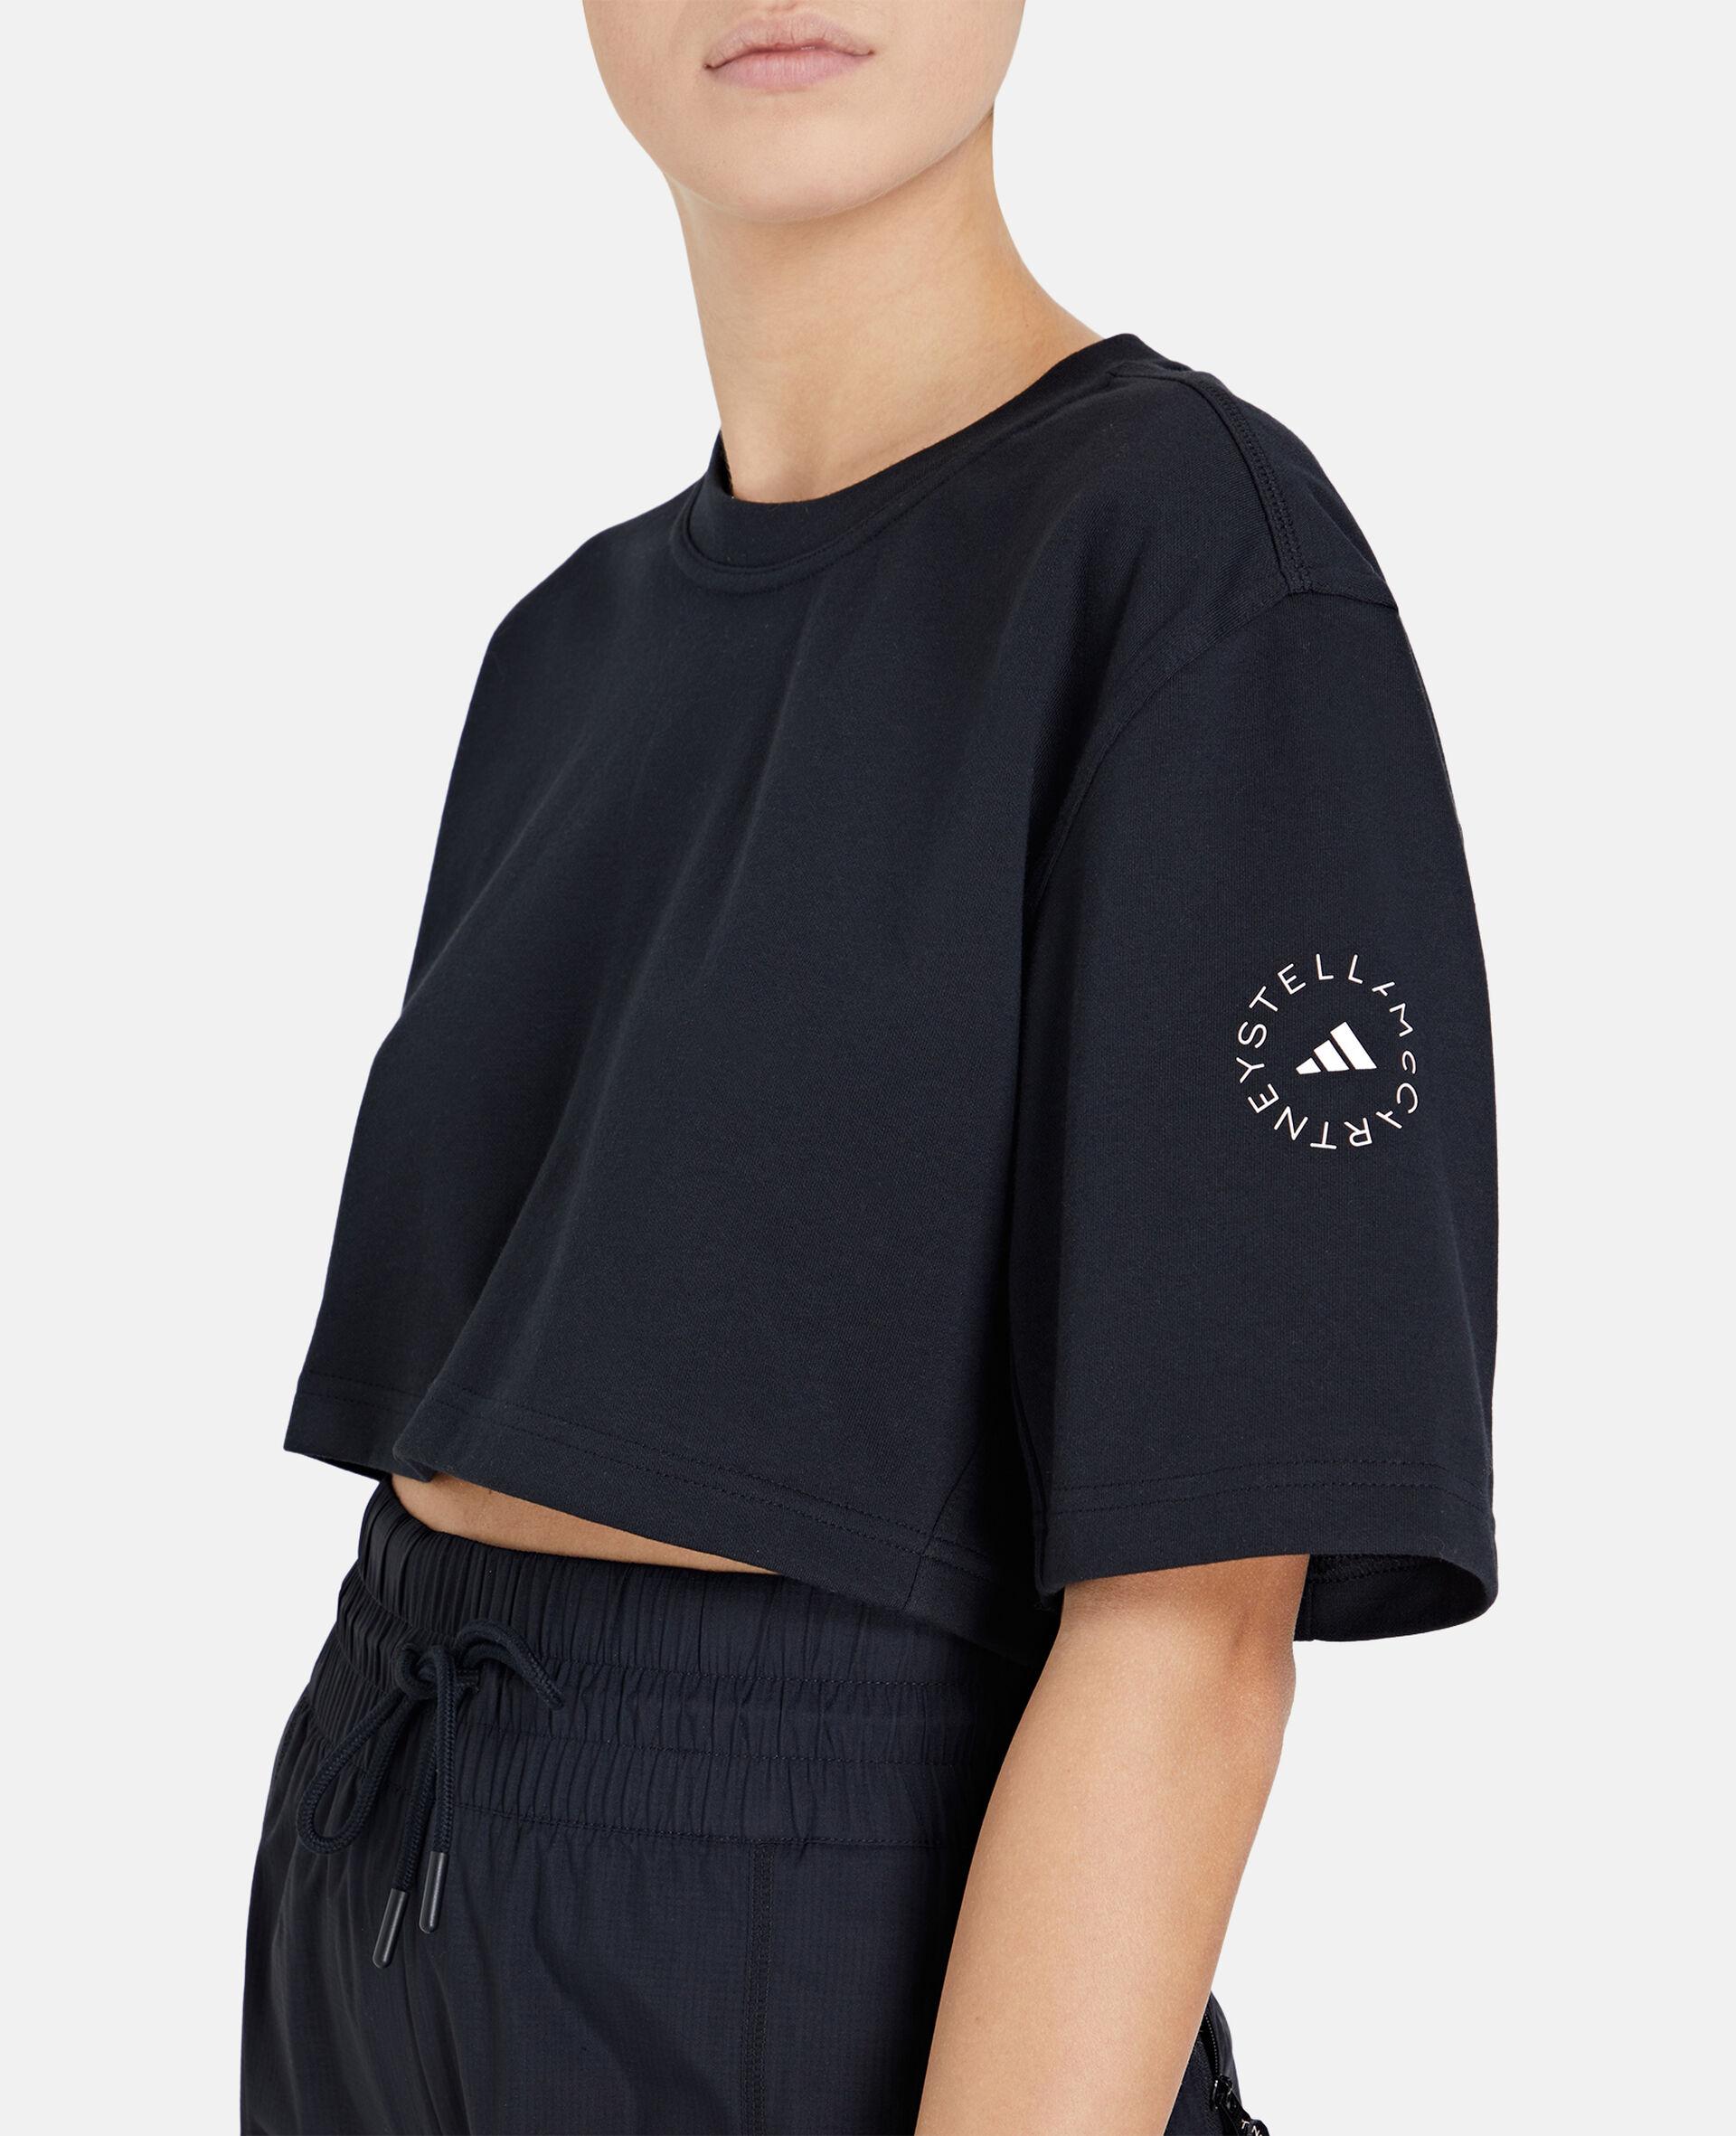 Future Playground Crop T-Shirt-Black-large image number 3